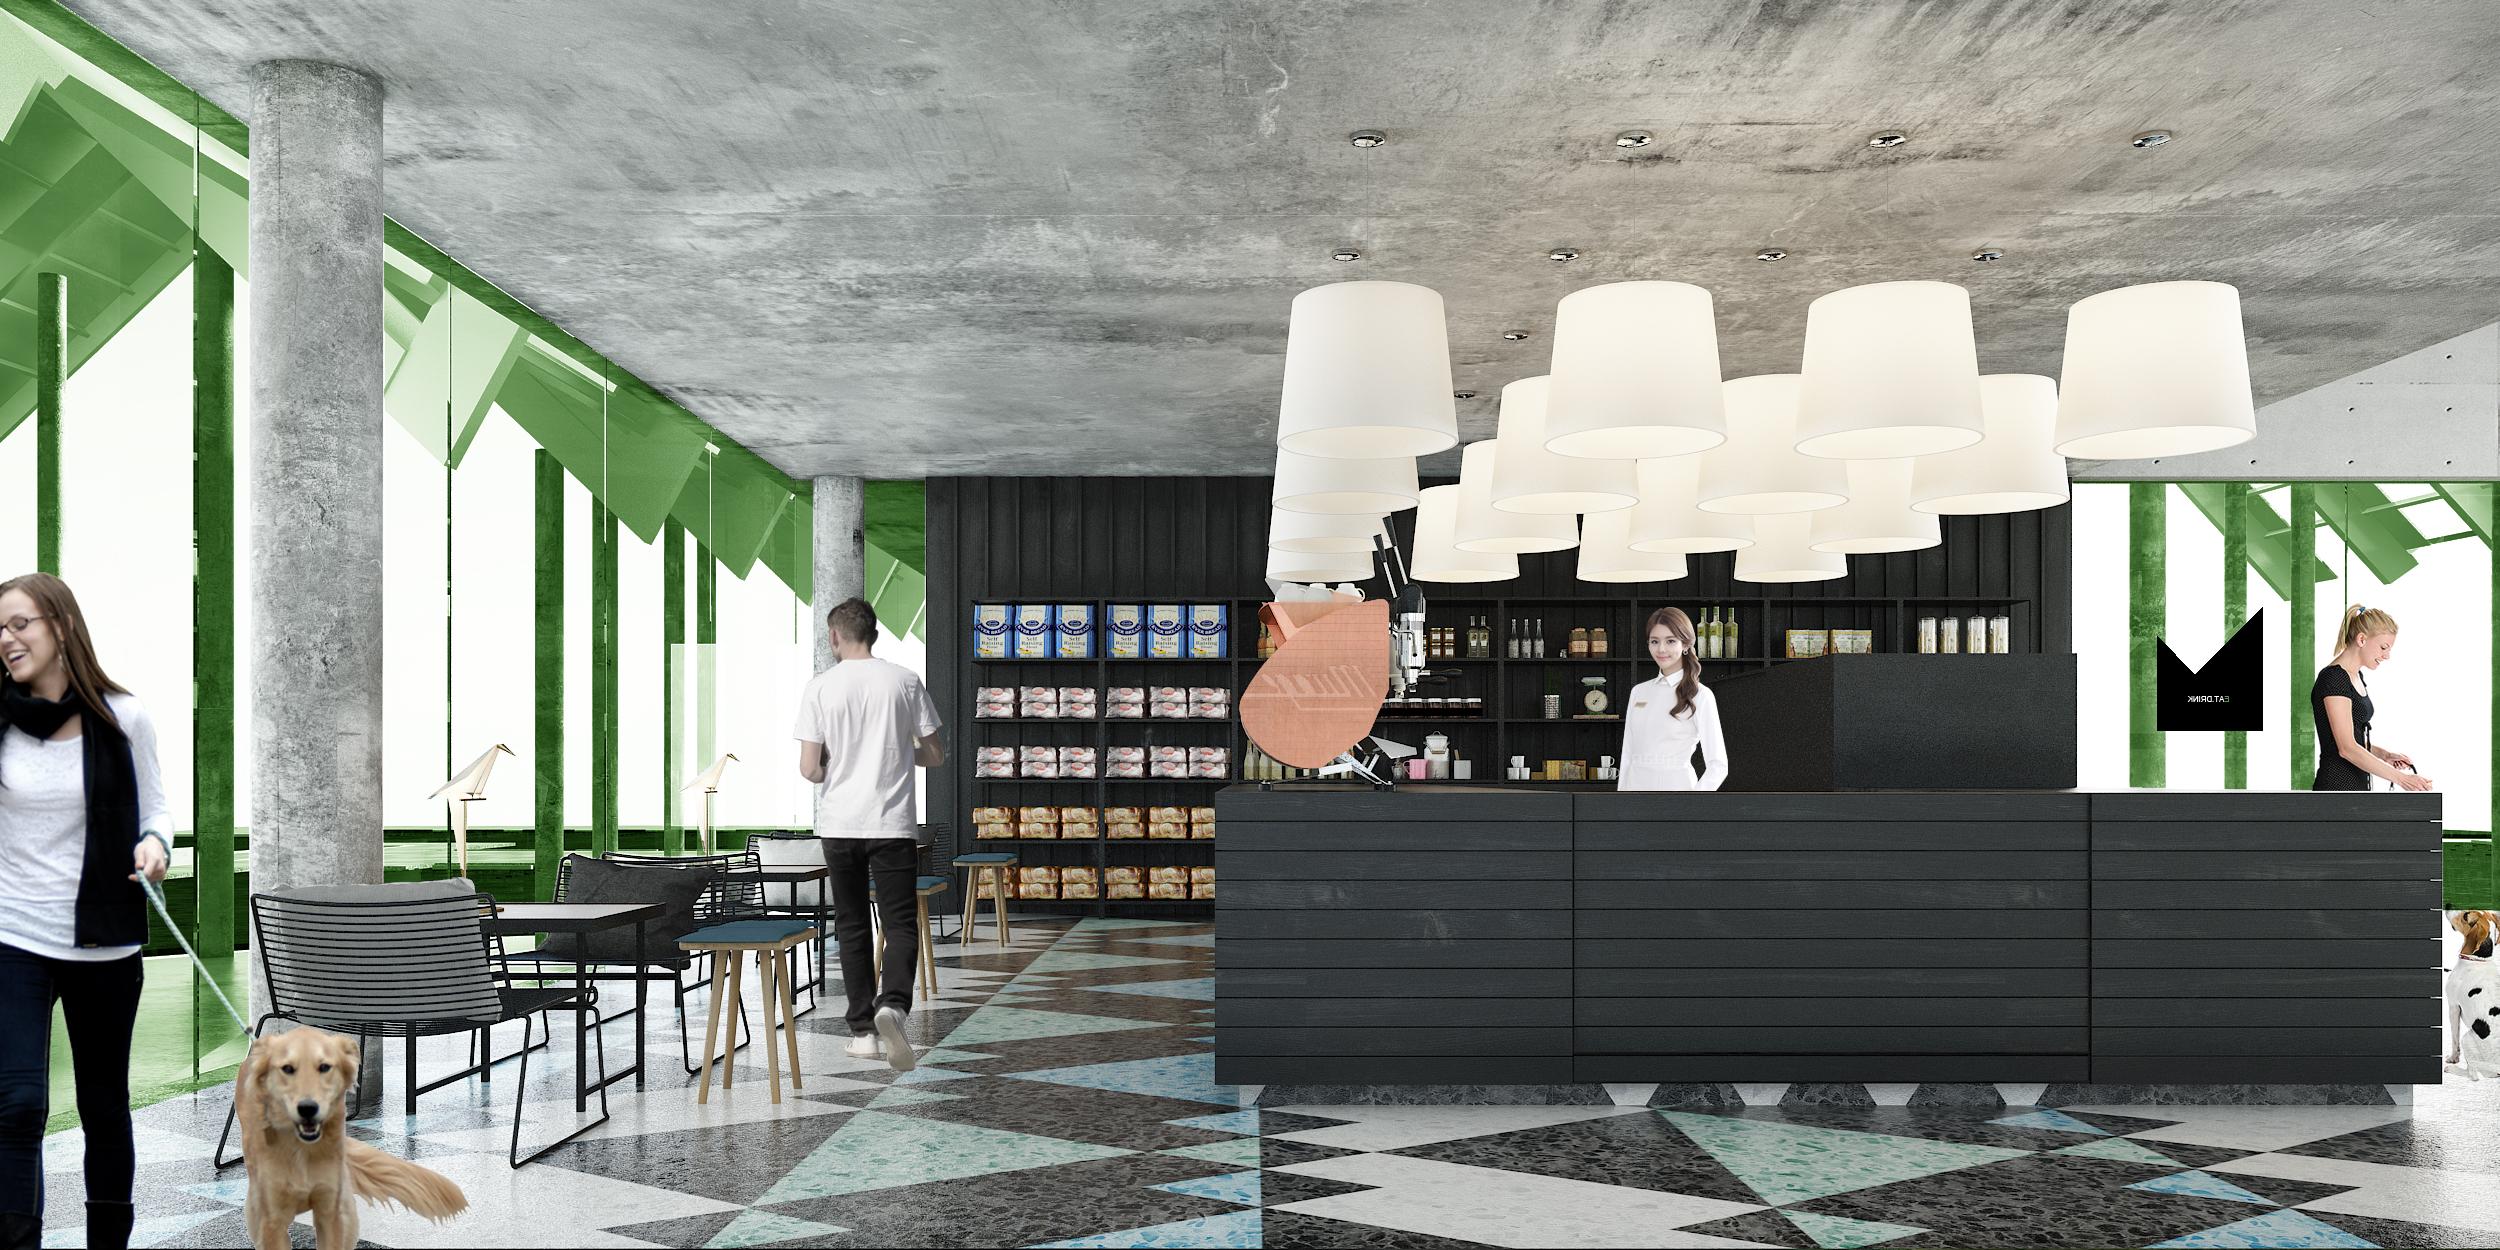 02 Cafe 02